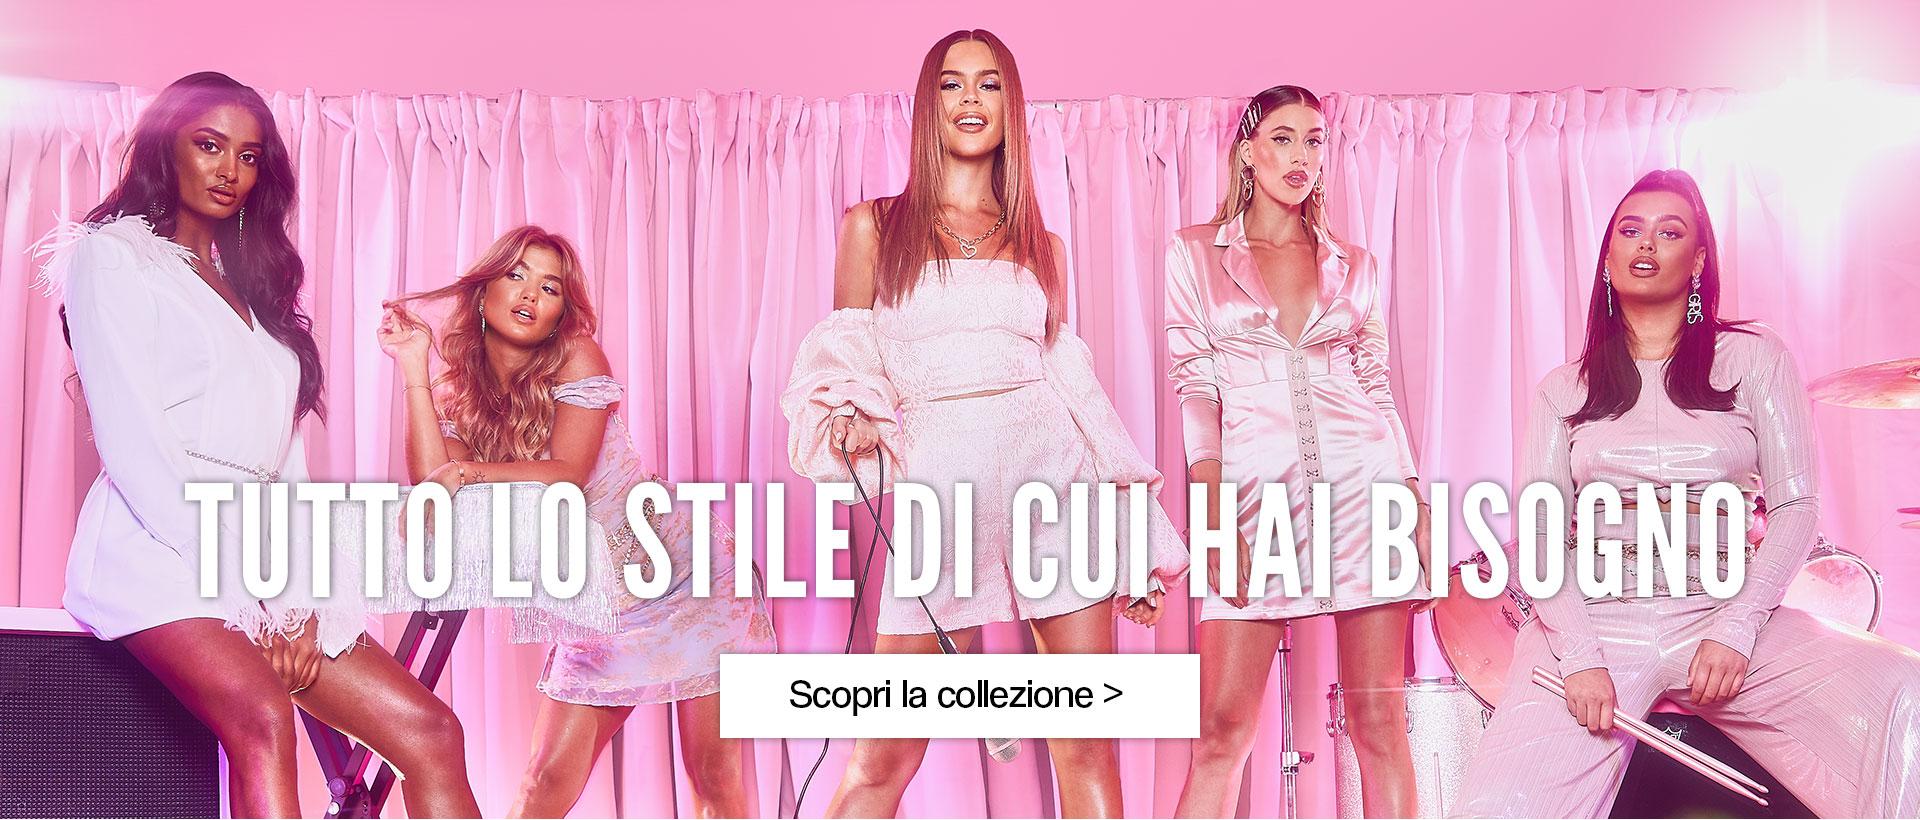 low priced 9bff5 172da Capi d'abbigliamento e moda donna e uomo, abbigliamento e ...